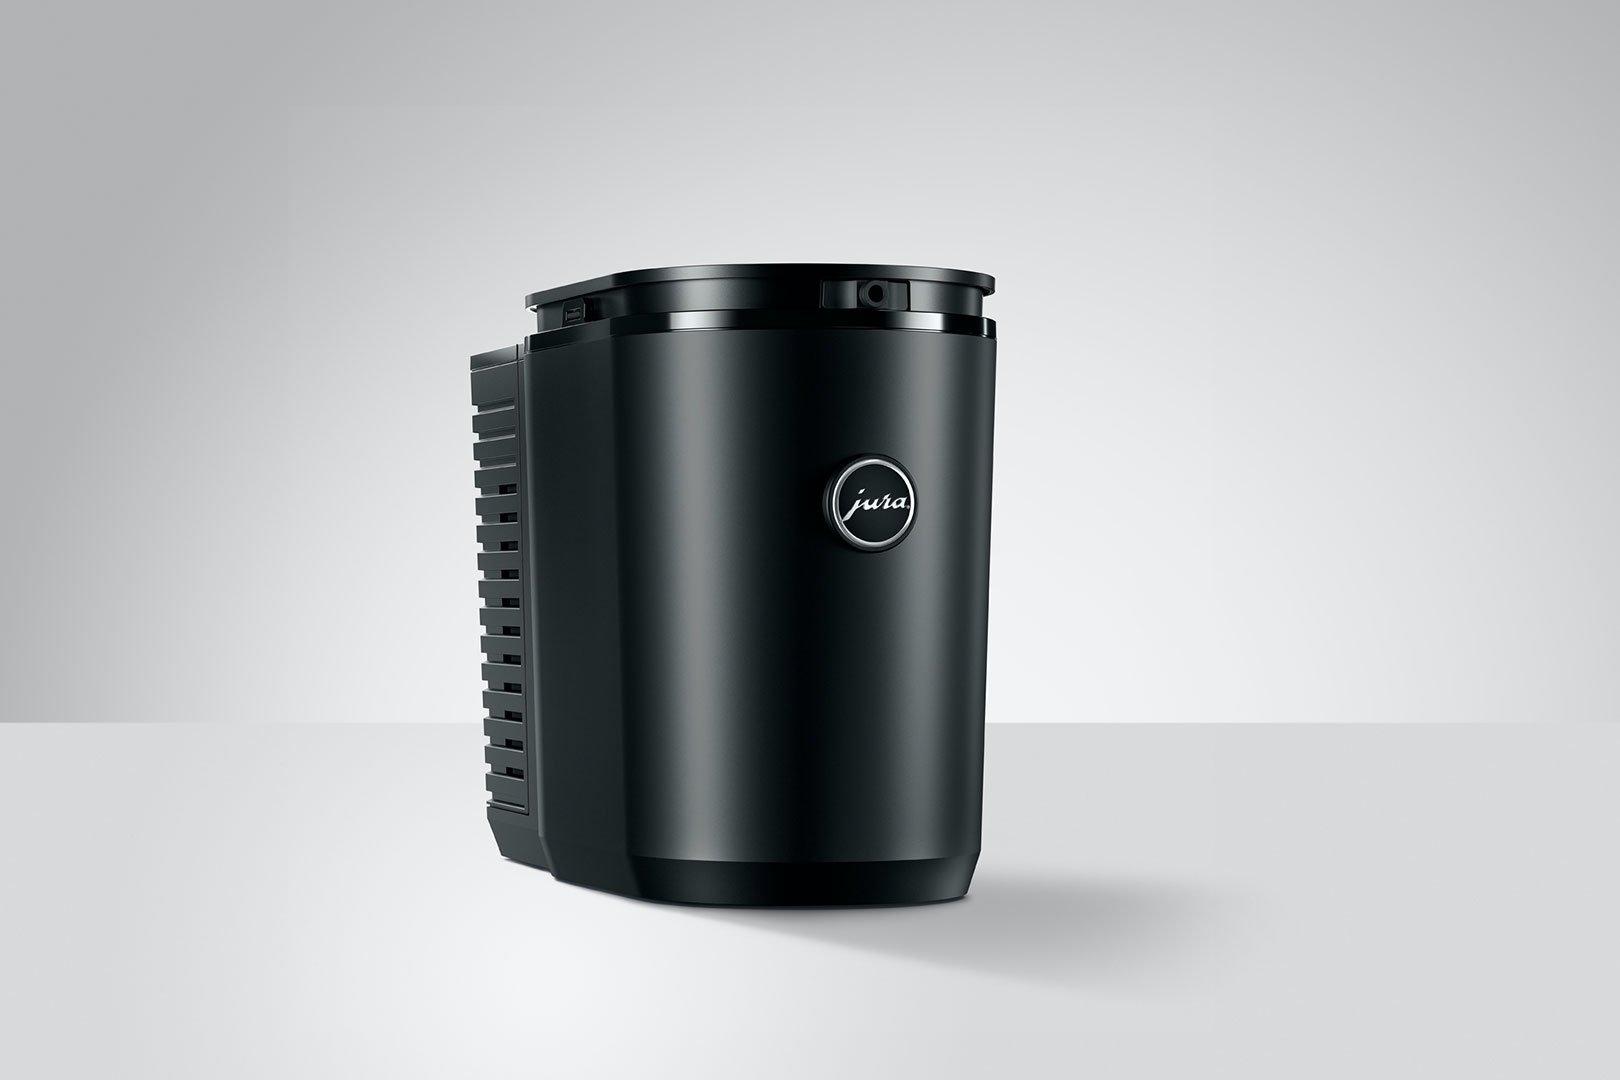 JURA Cool Control - 2.5 liter